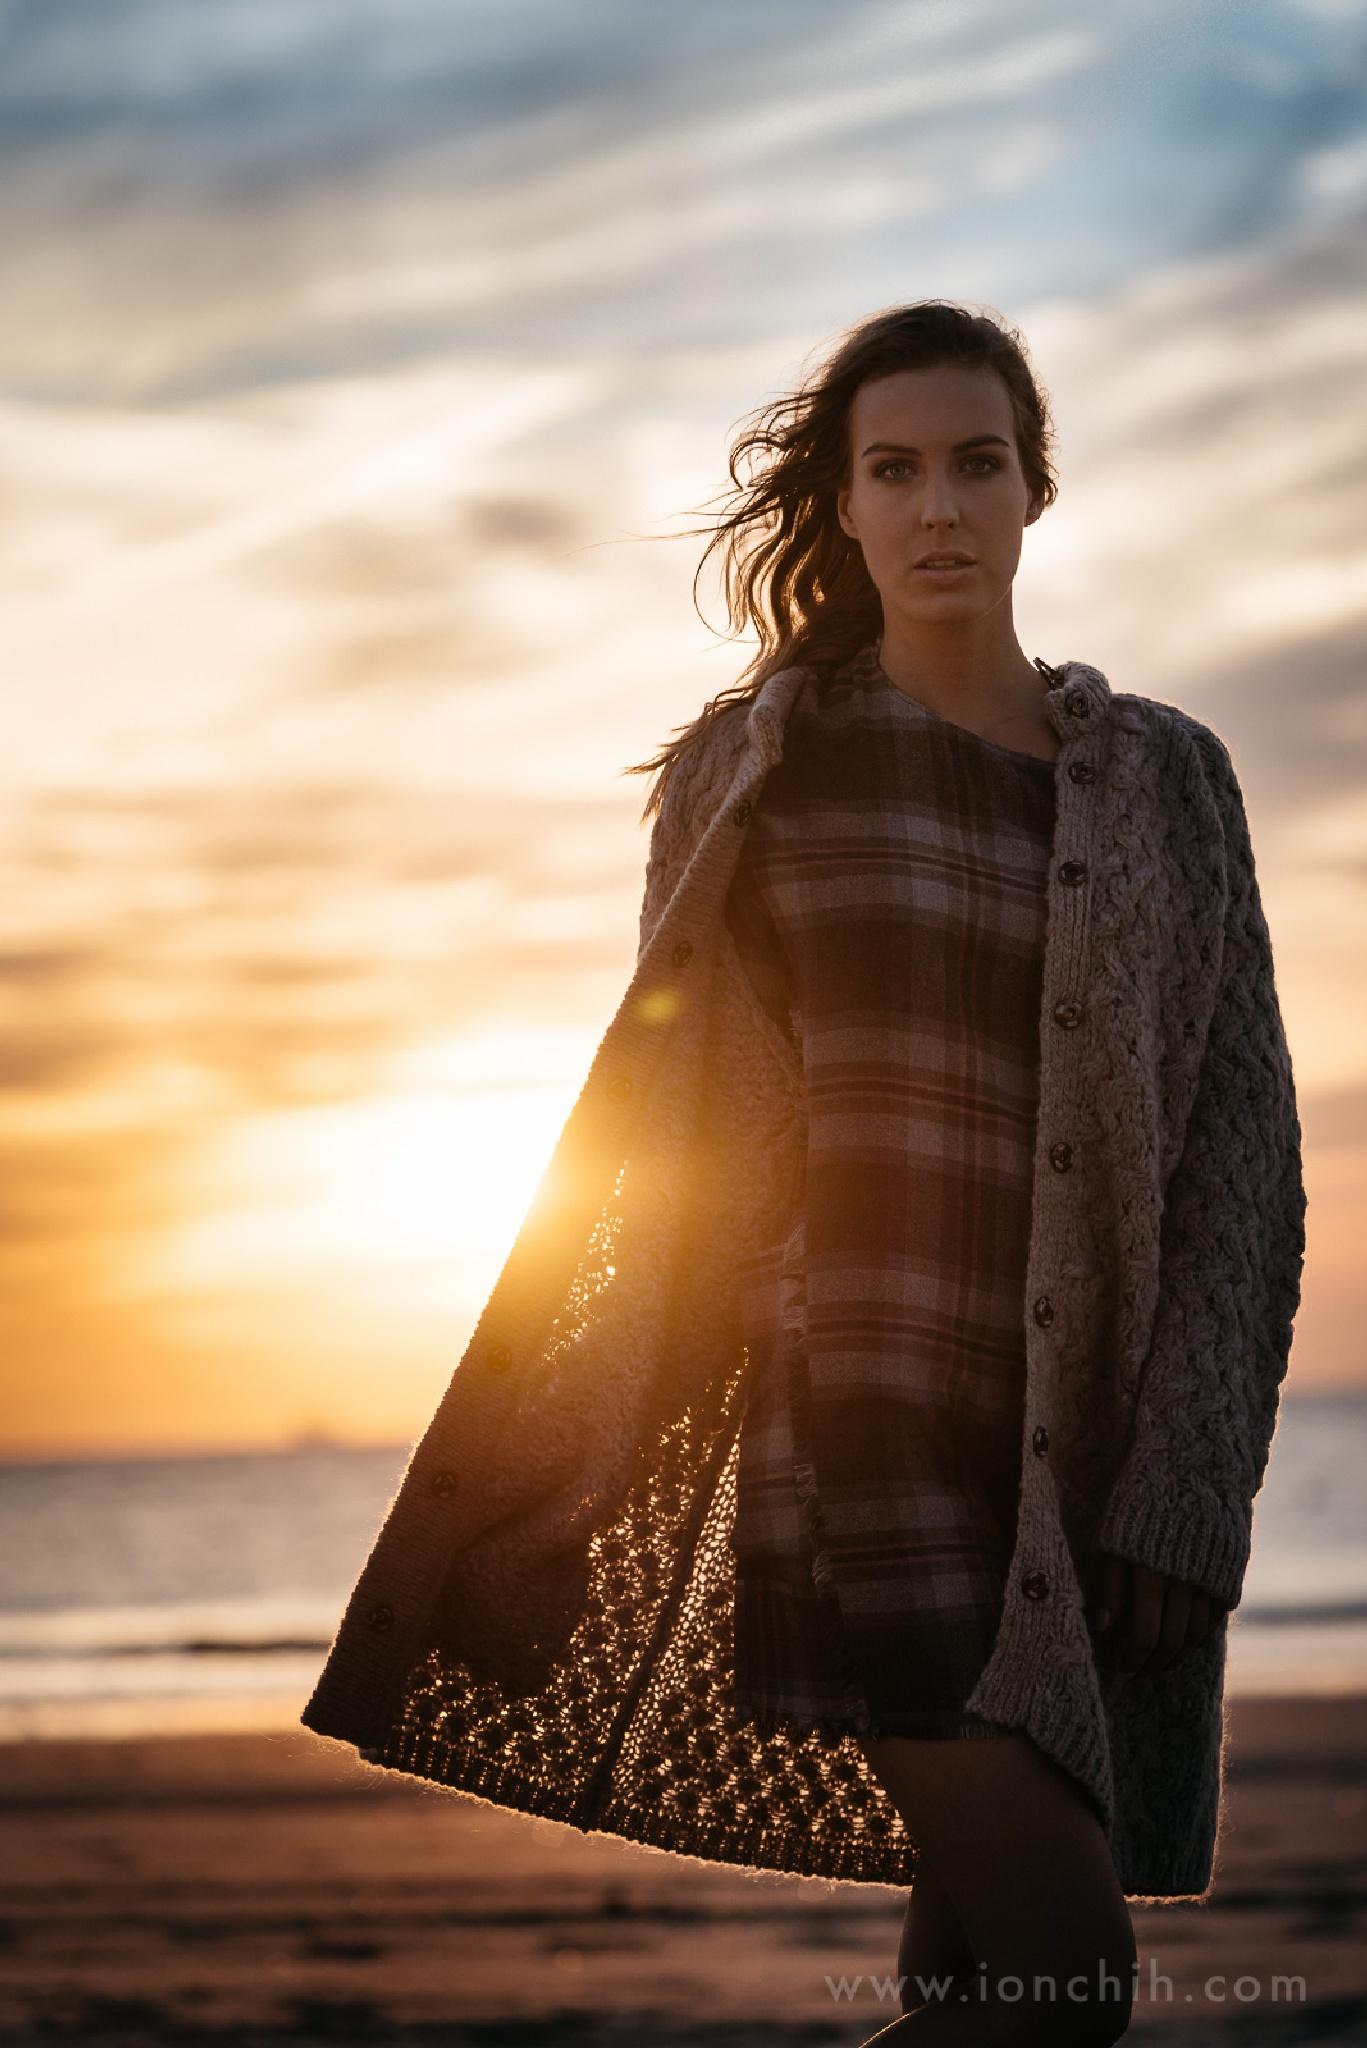 Autumn beach  model: @Simone Hesselmans mua: @Suzy's Place stylist: @Paula de Goffau  by Ion Chih